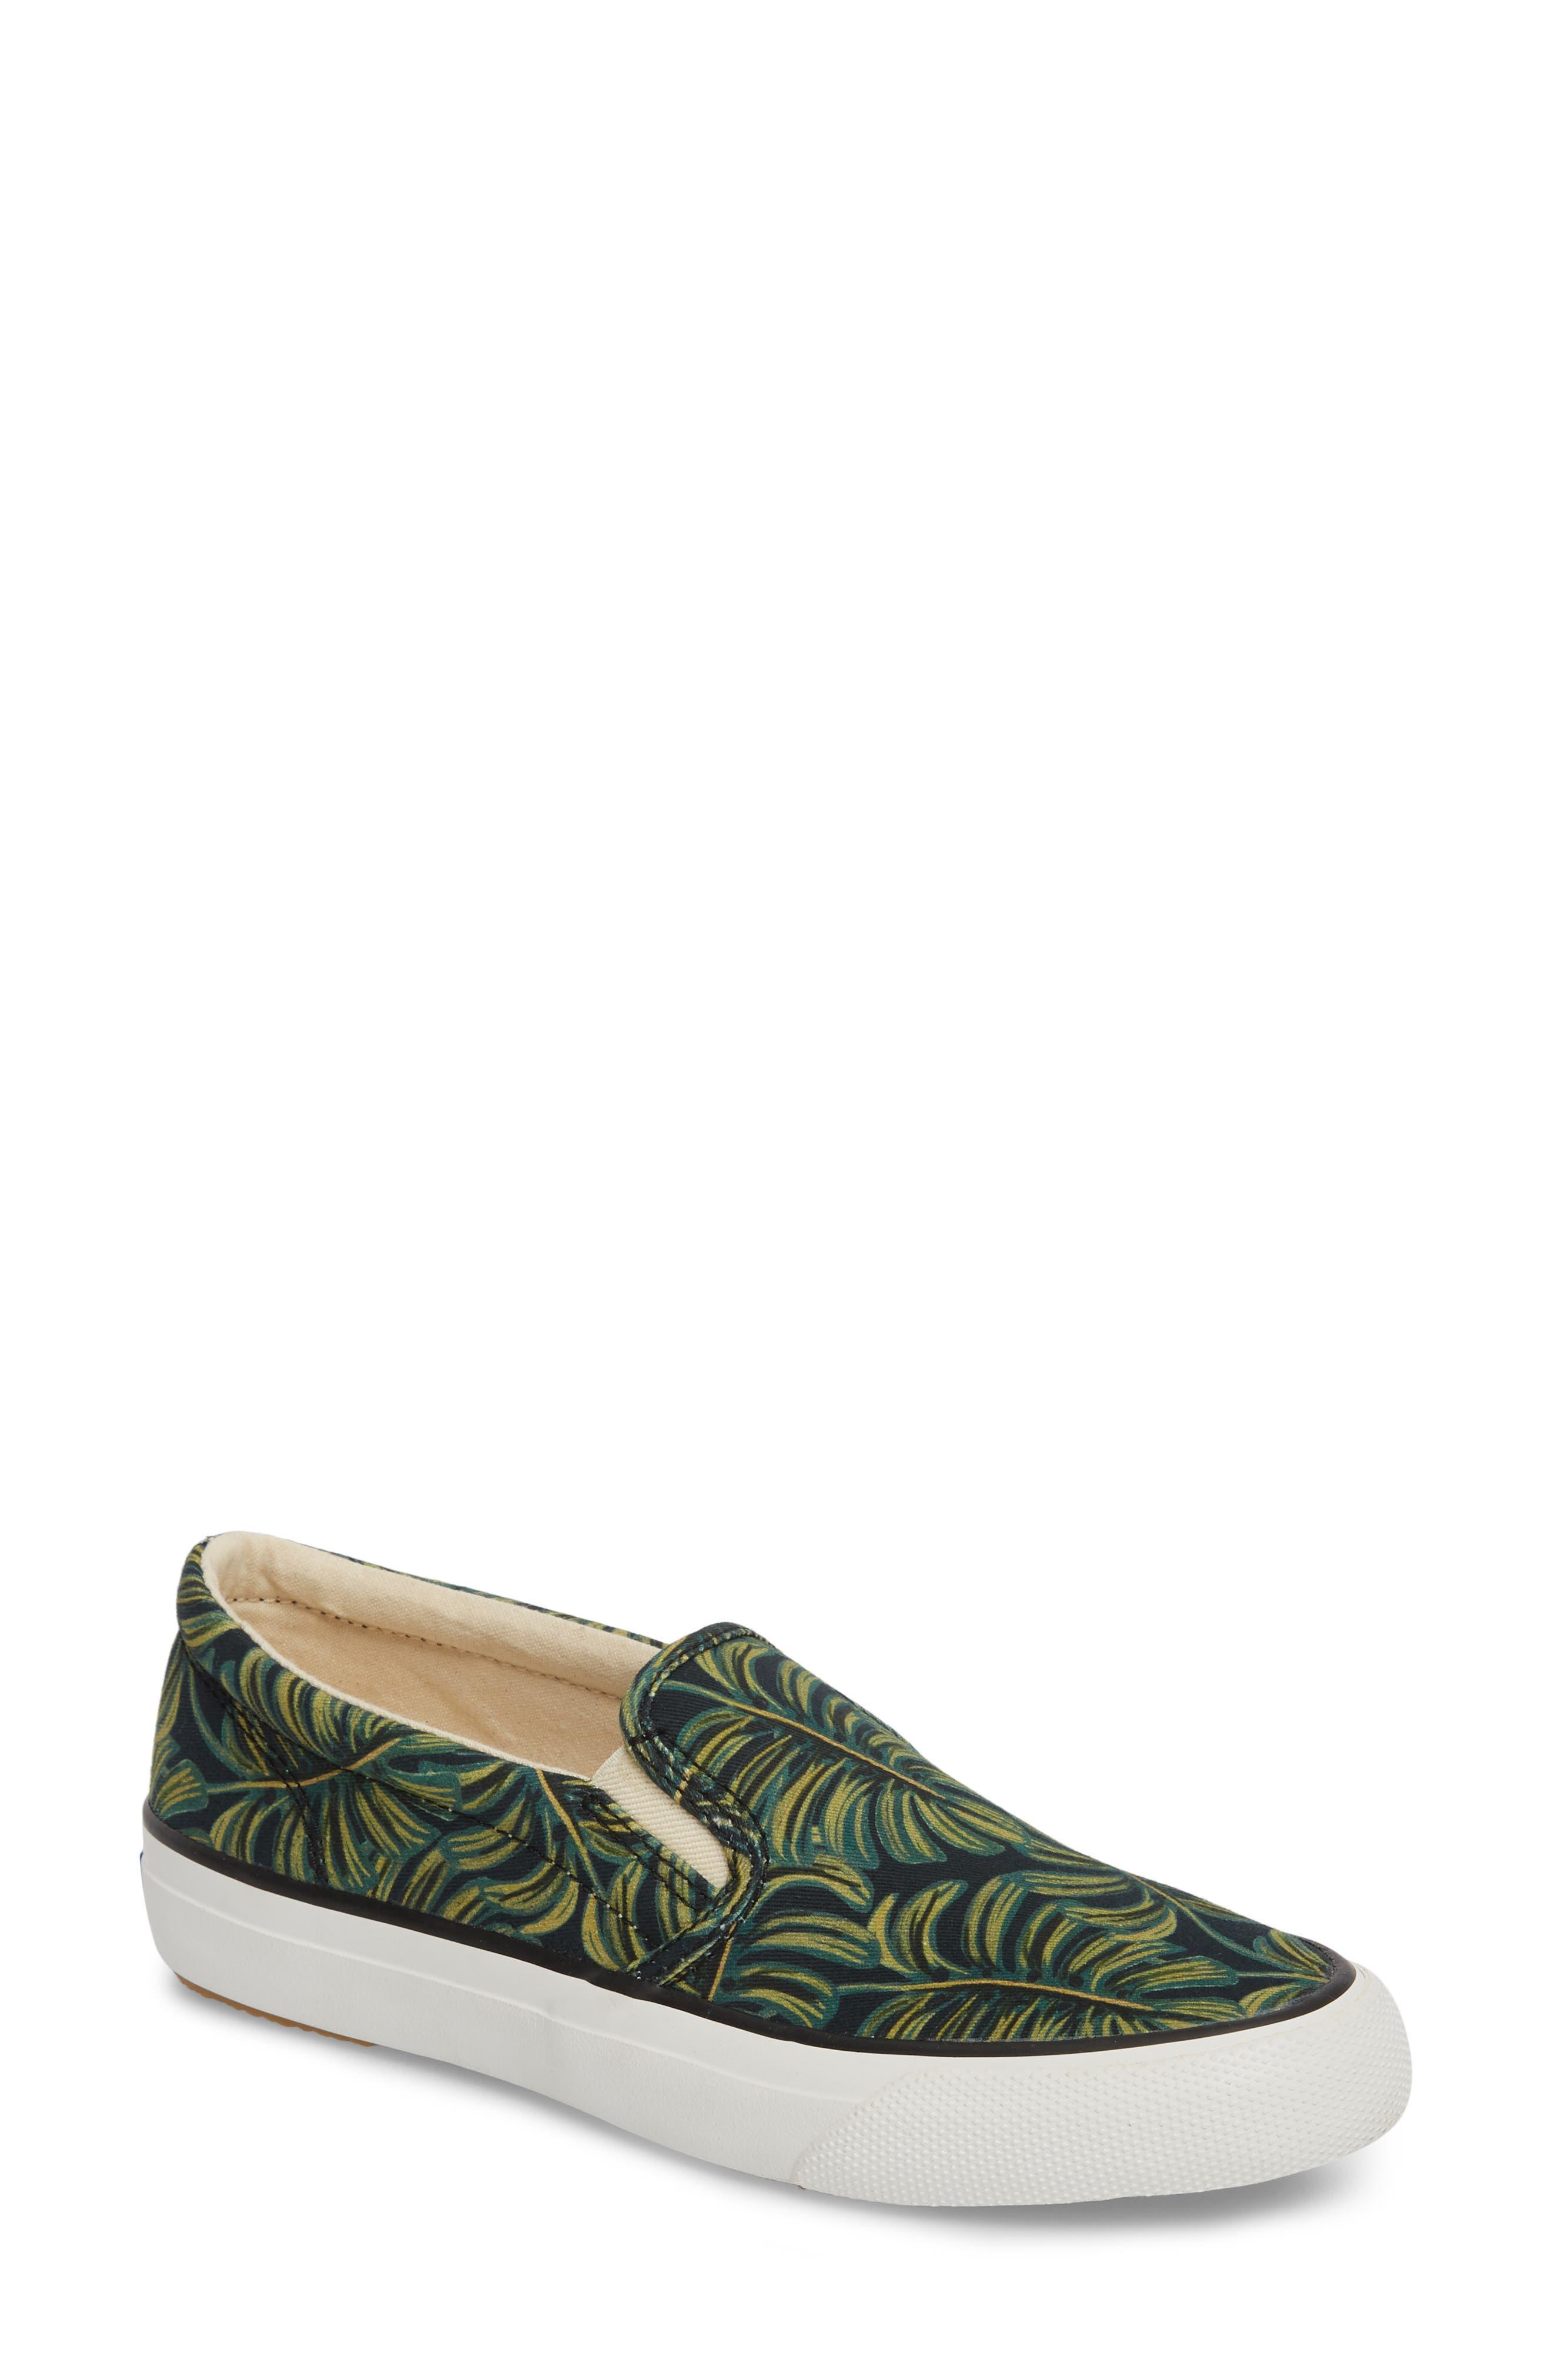 Keds® x Rifle Paper Co. Anchor Palms Slip-On Sneaker (Women)